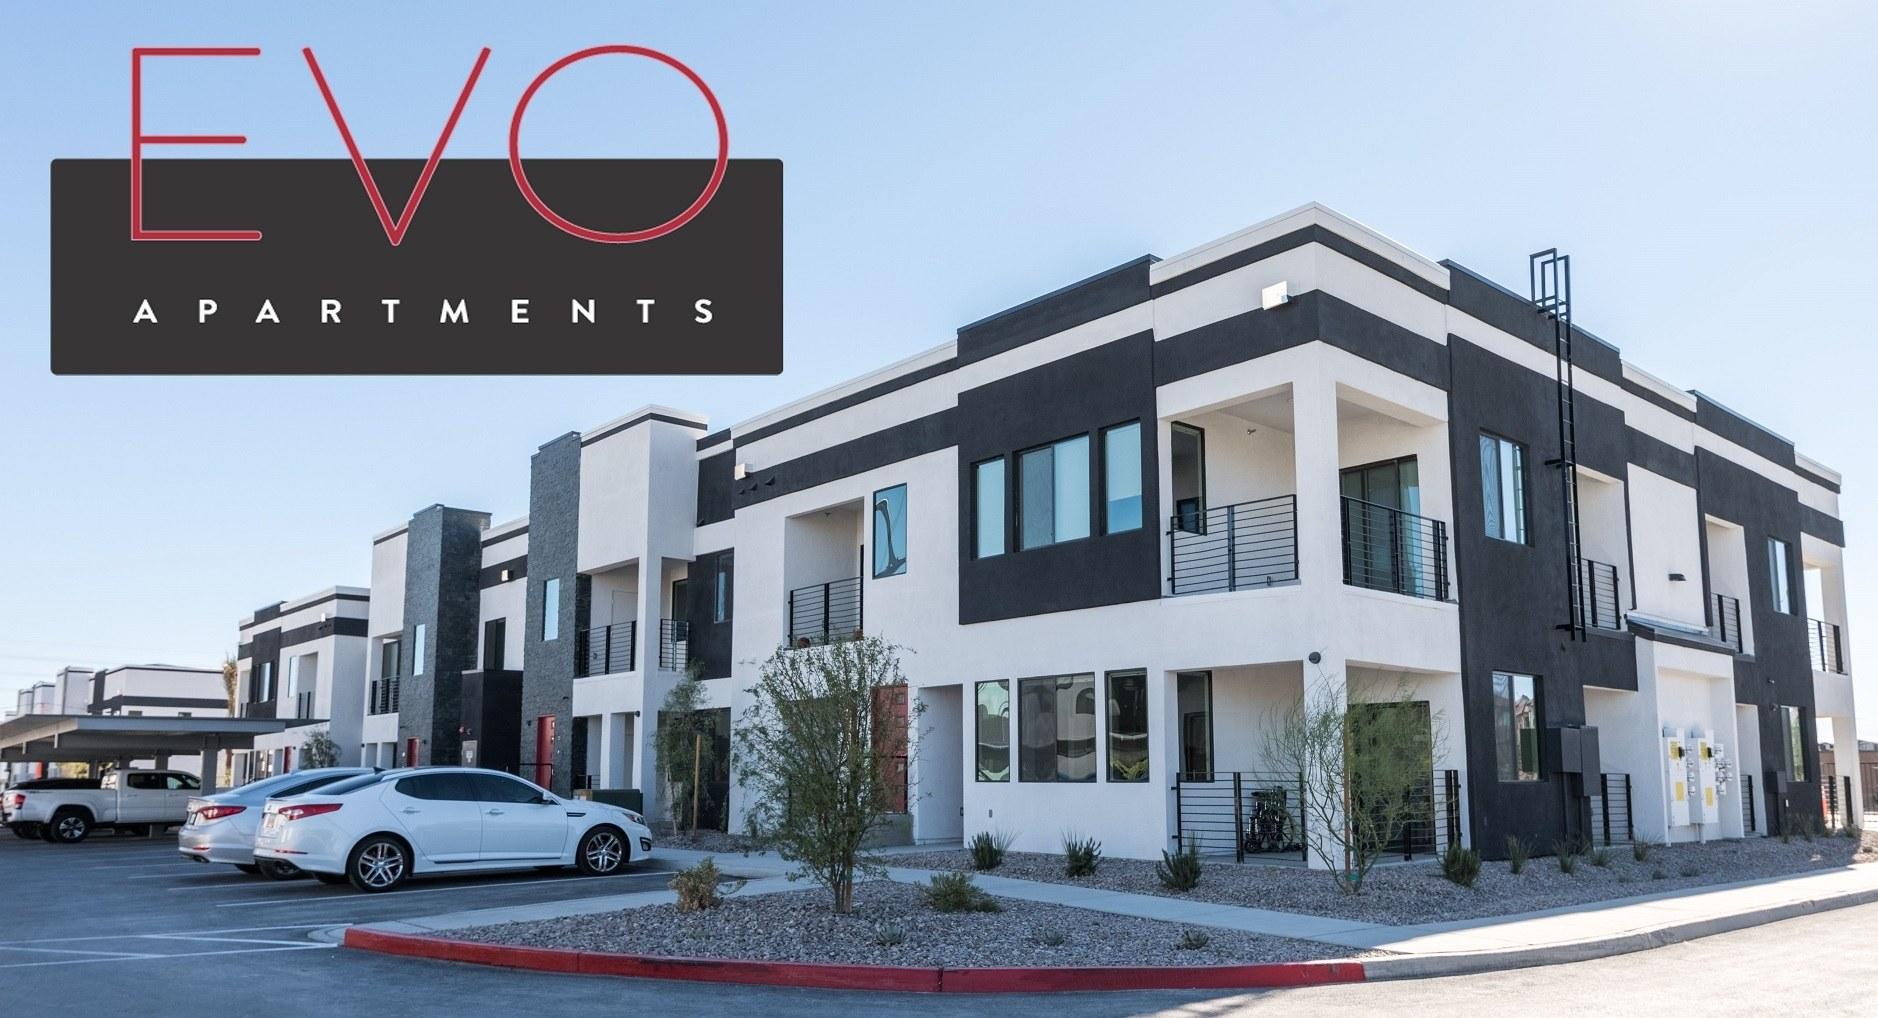 Photos of EVO Apartments in Las Vegas, NV